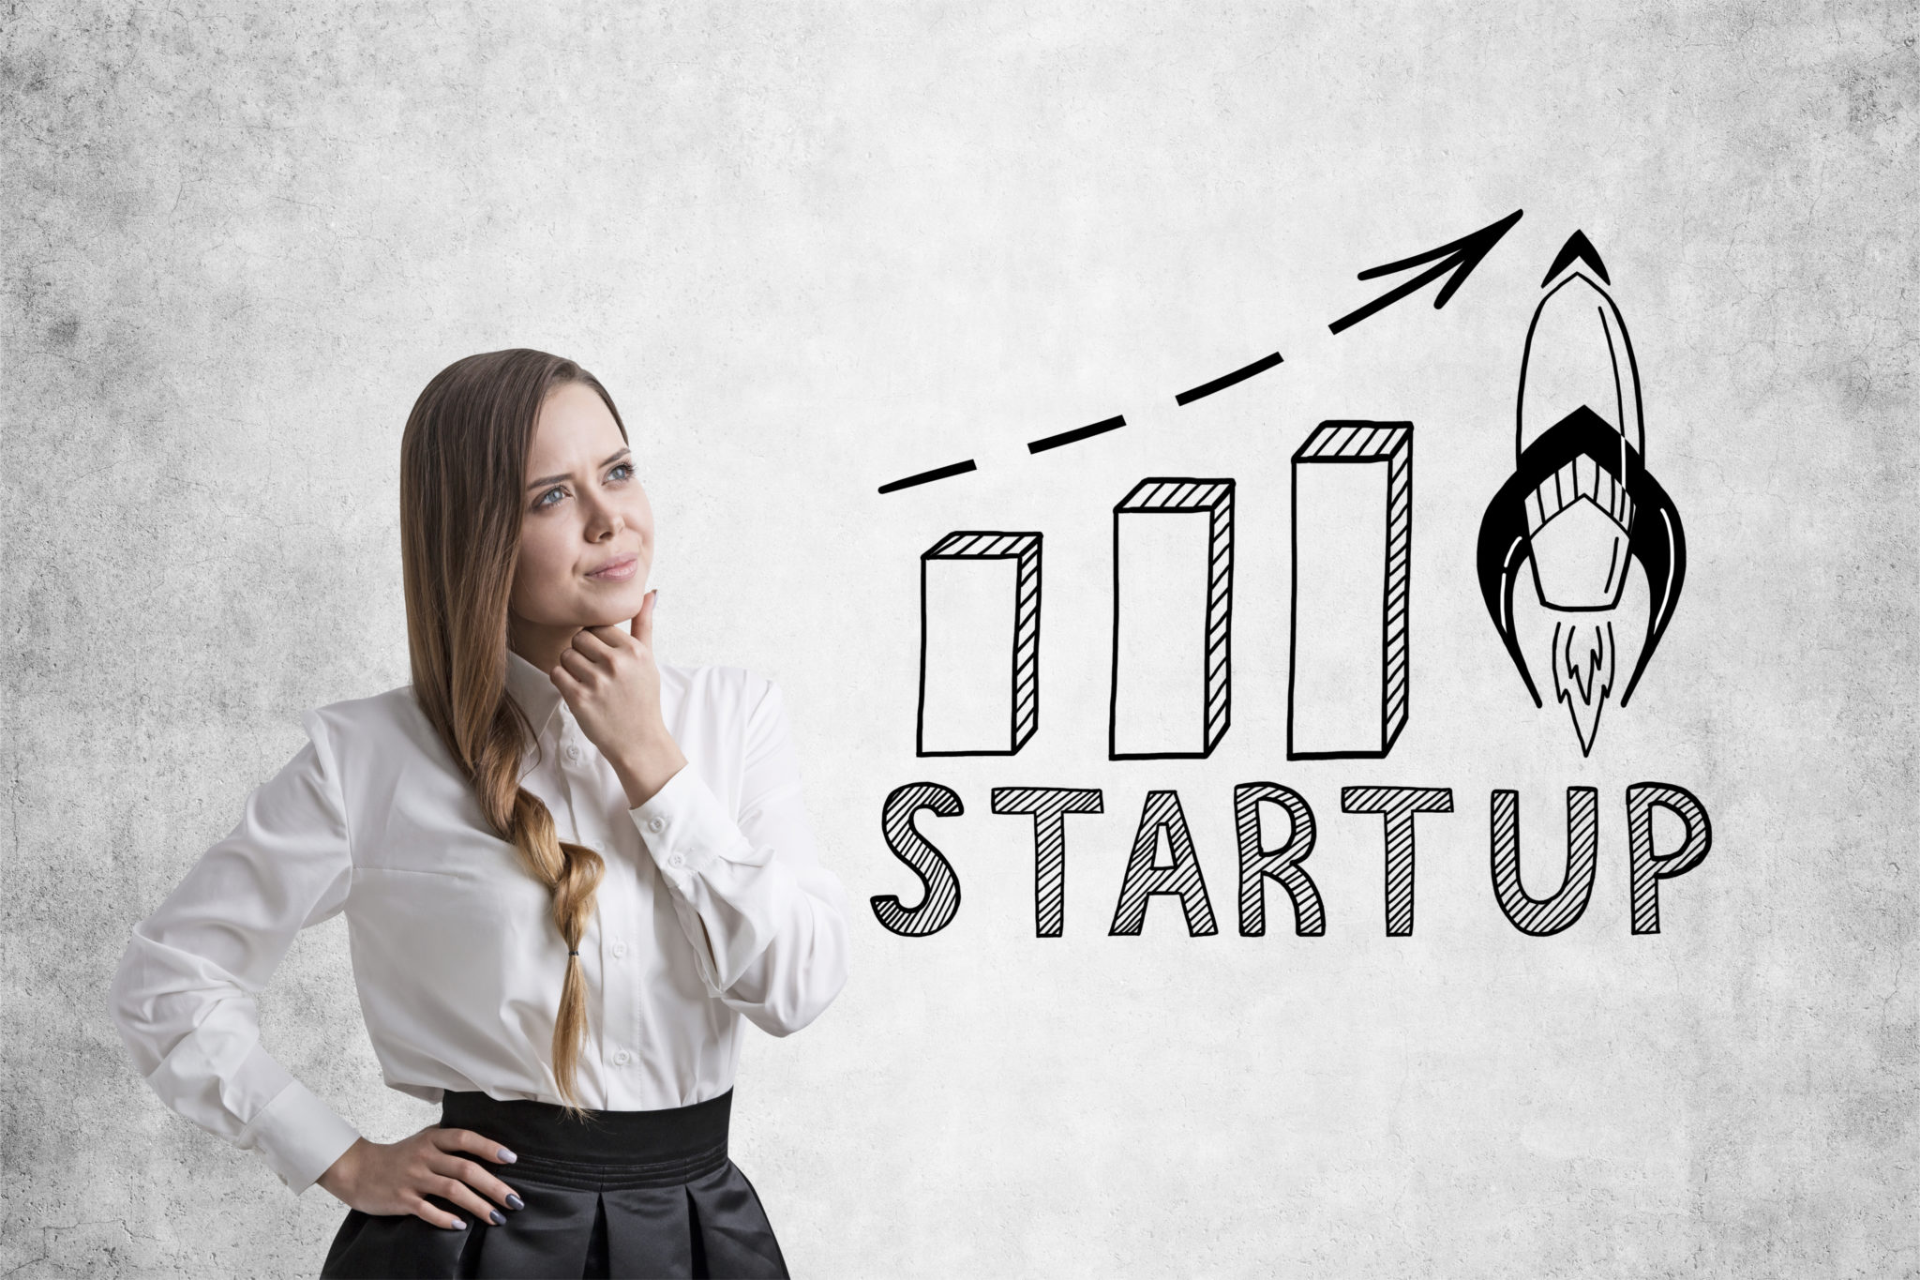 Startup Value